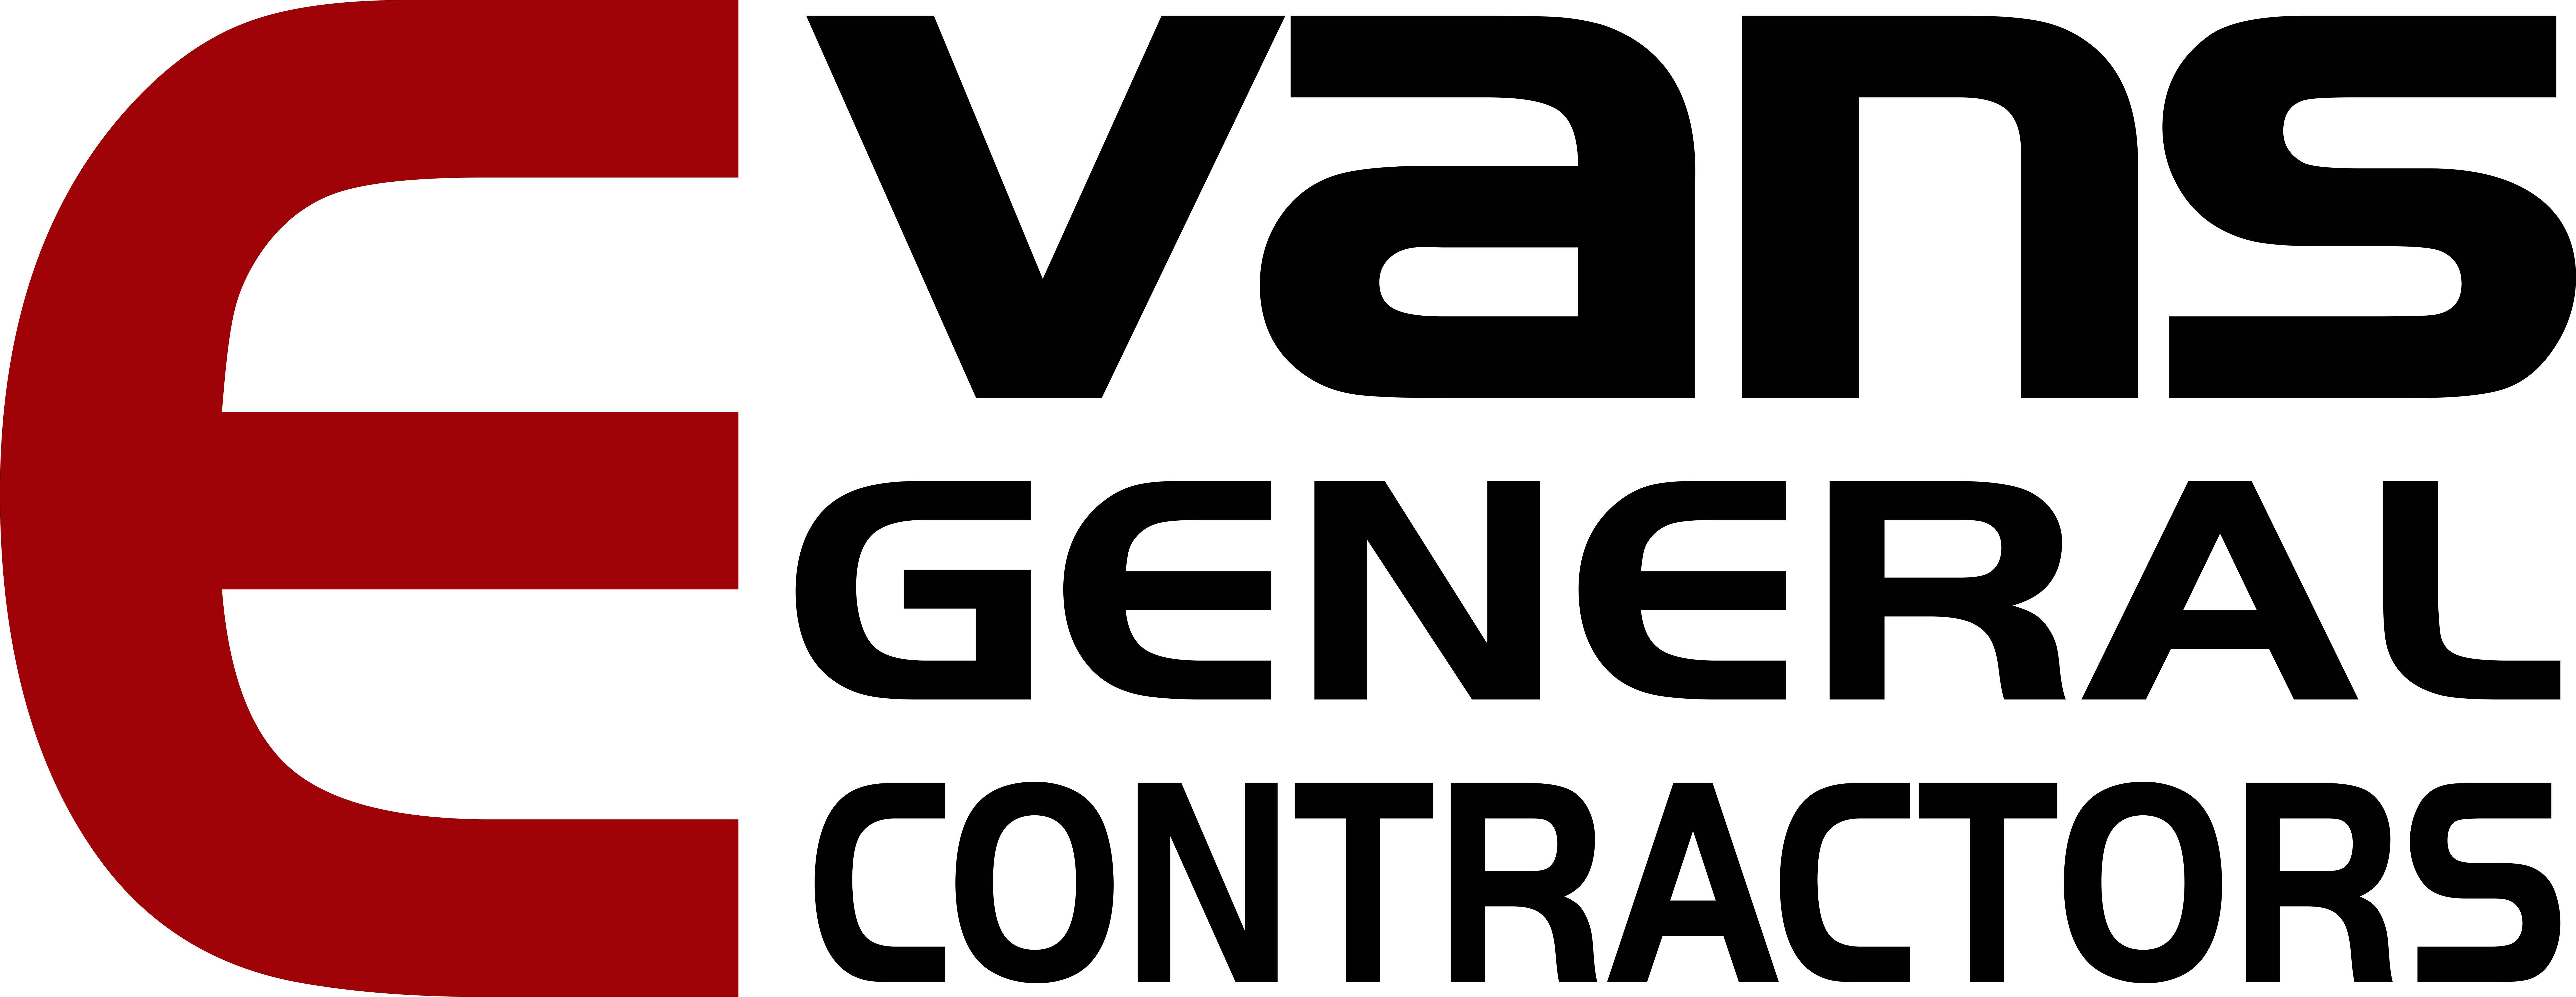 Evans General Contractors-logo